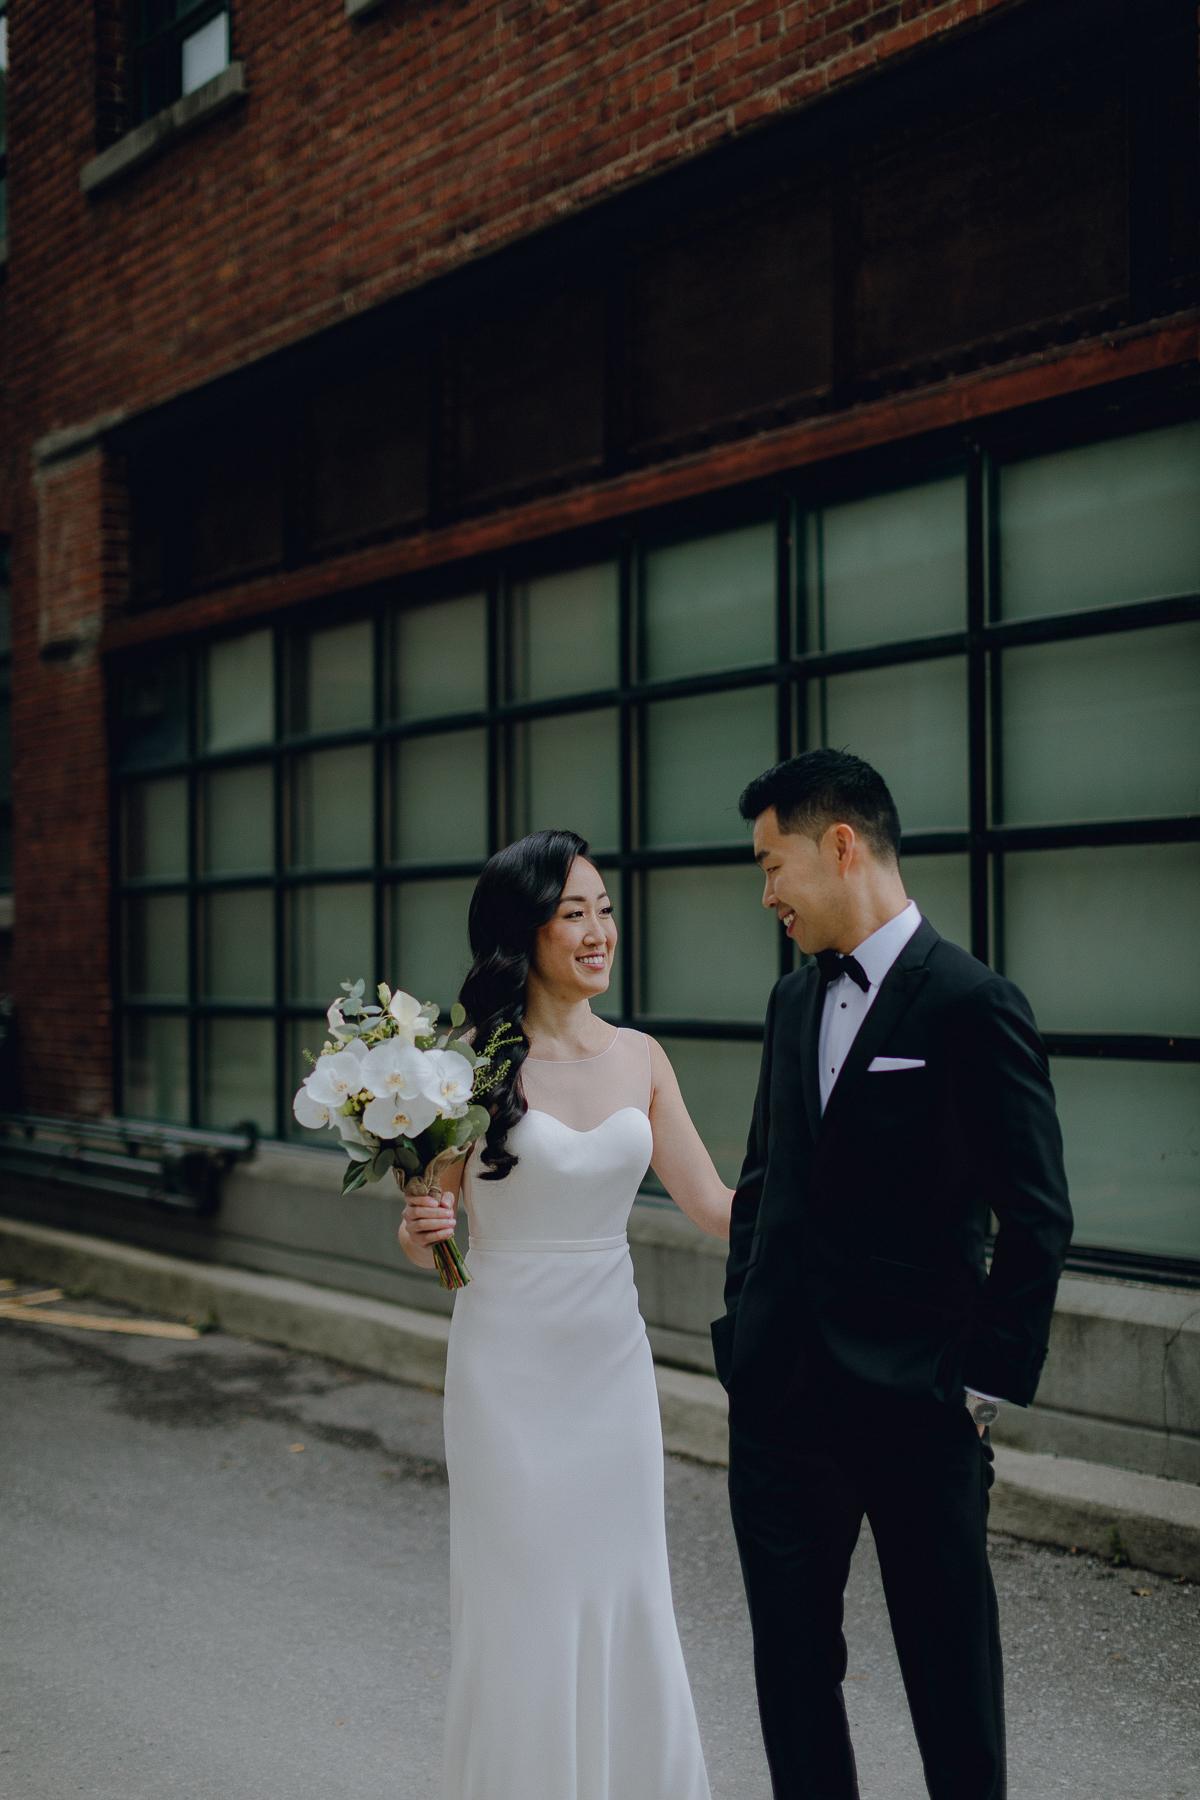 cannoe-restaurannt-wedding 0015.jpg